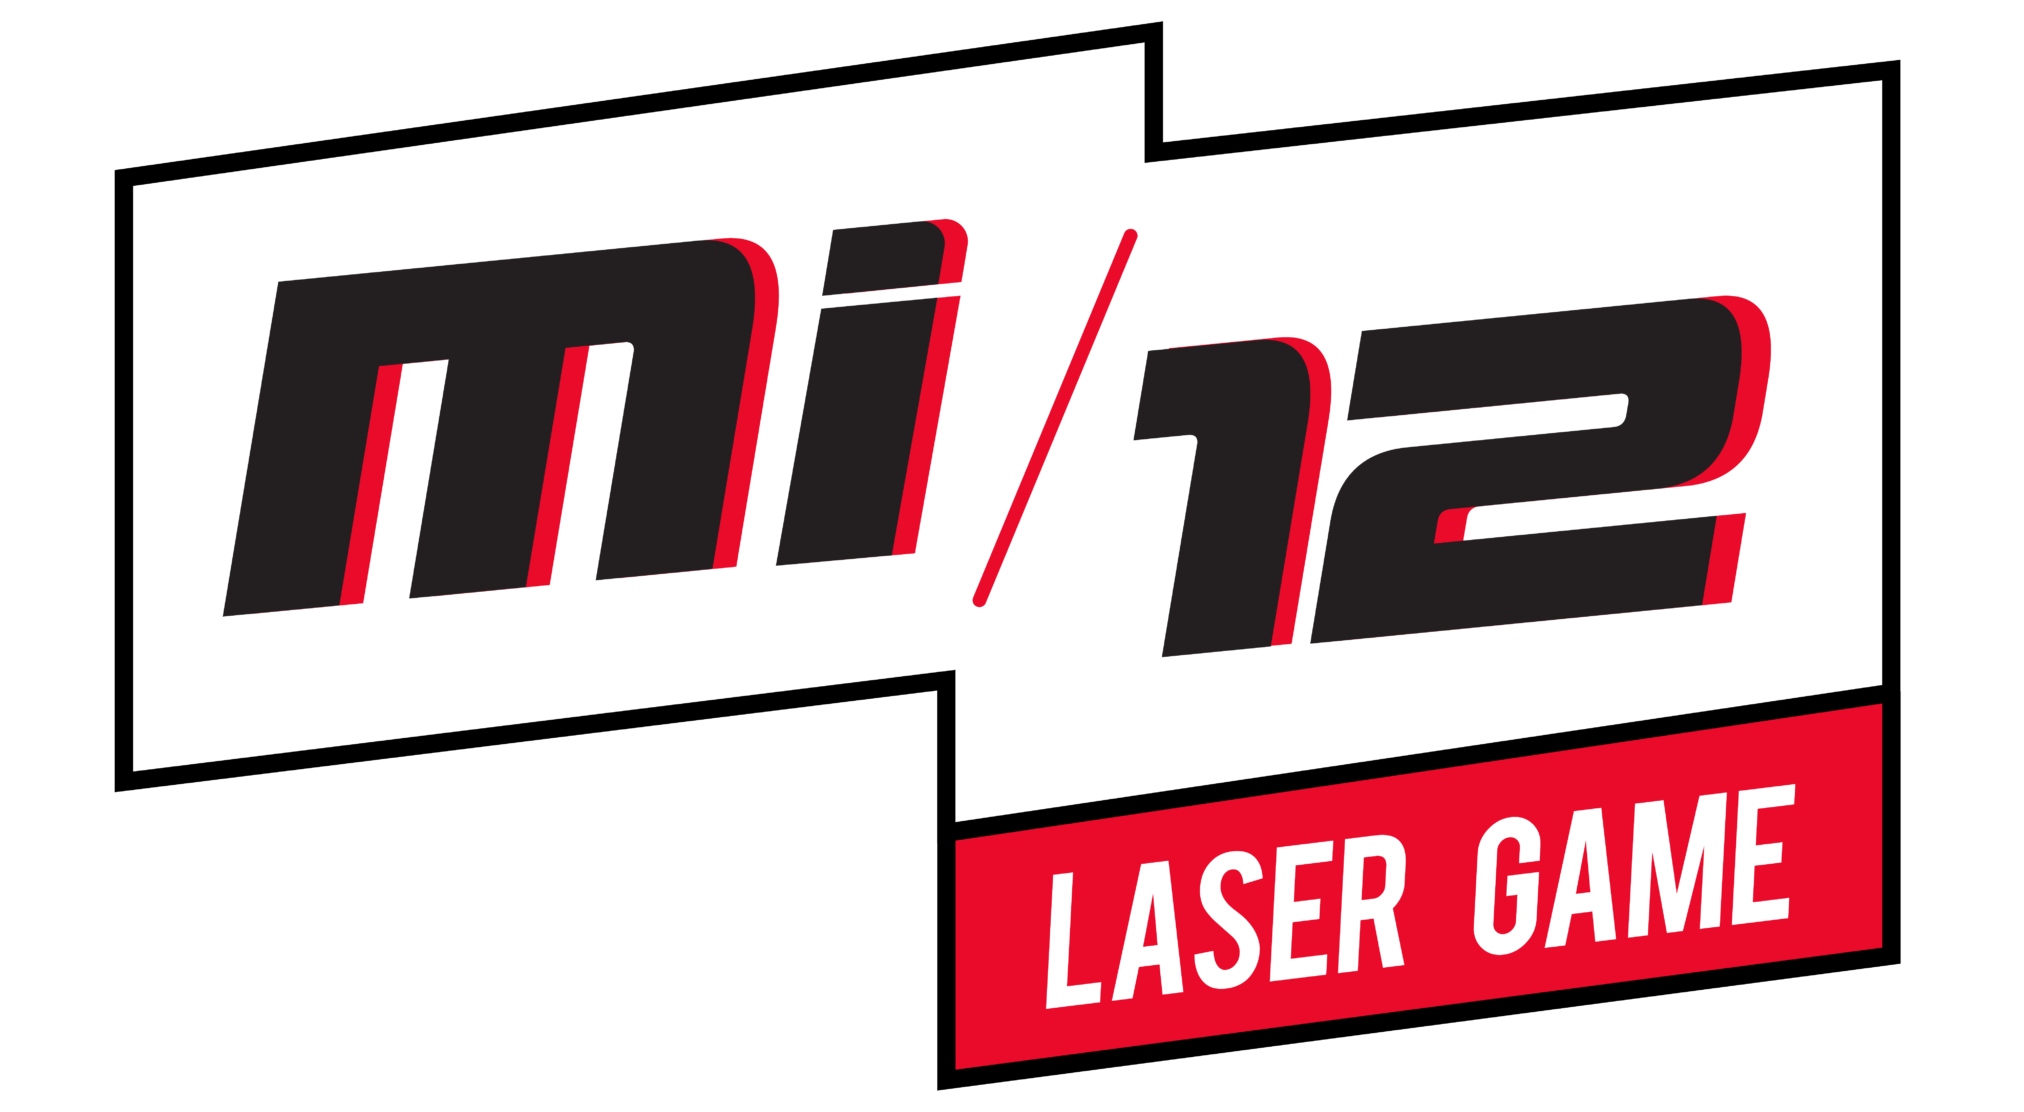 Laser game MI-12